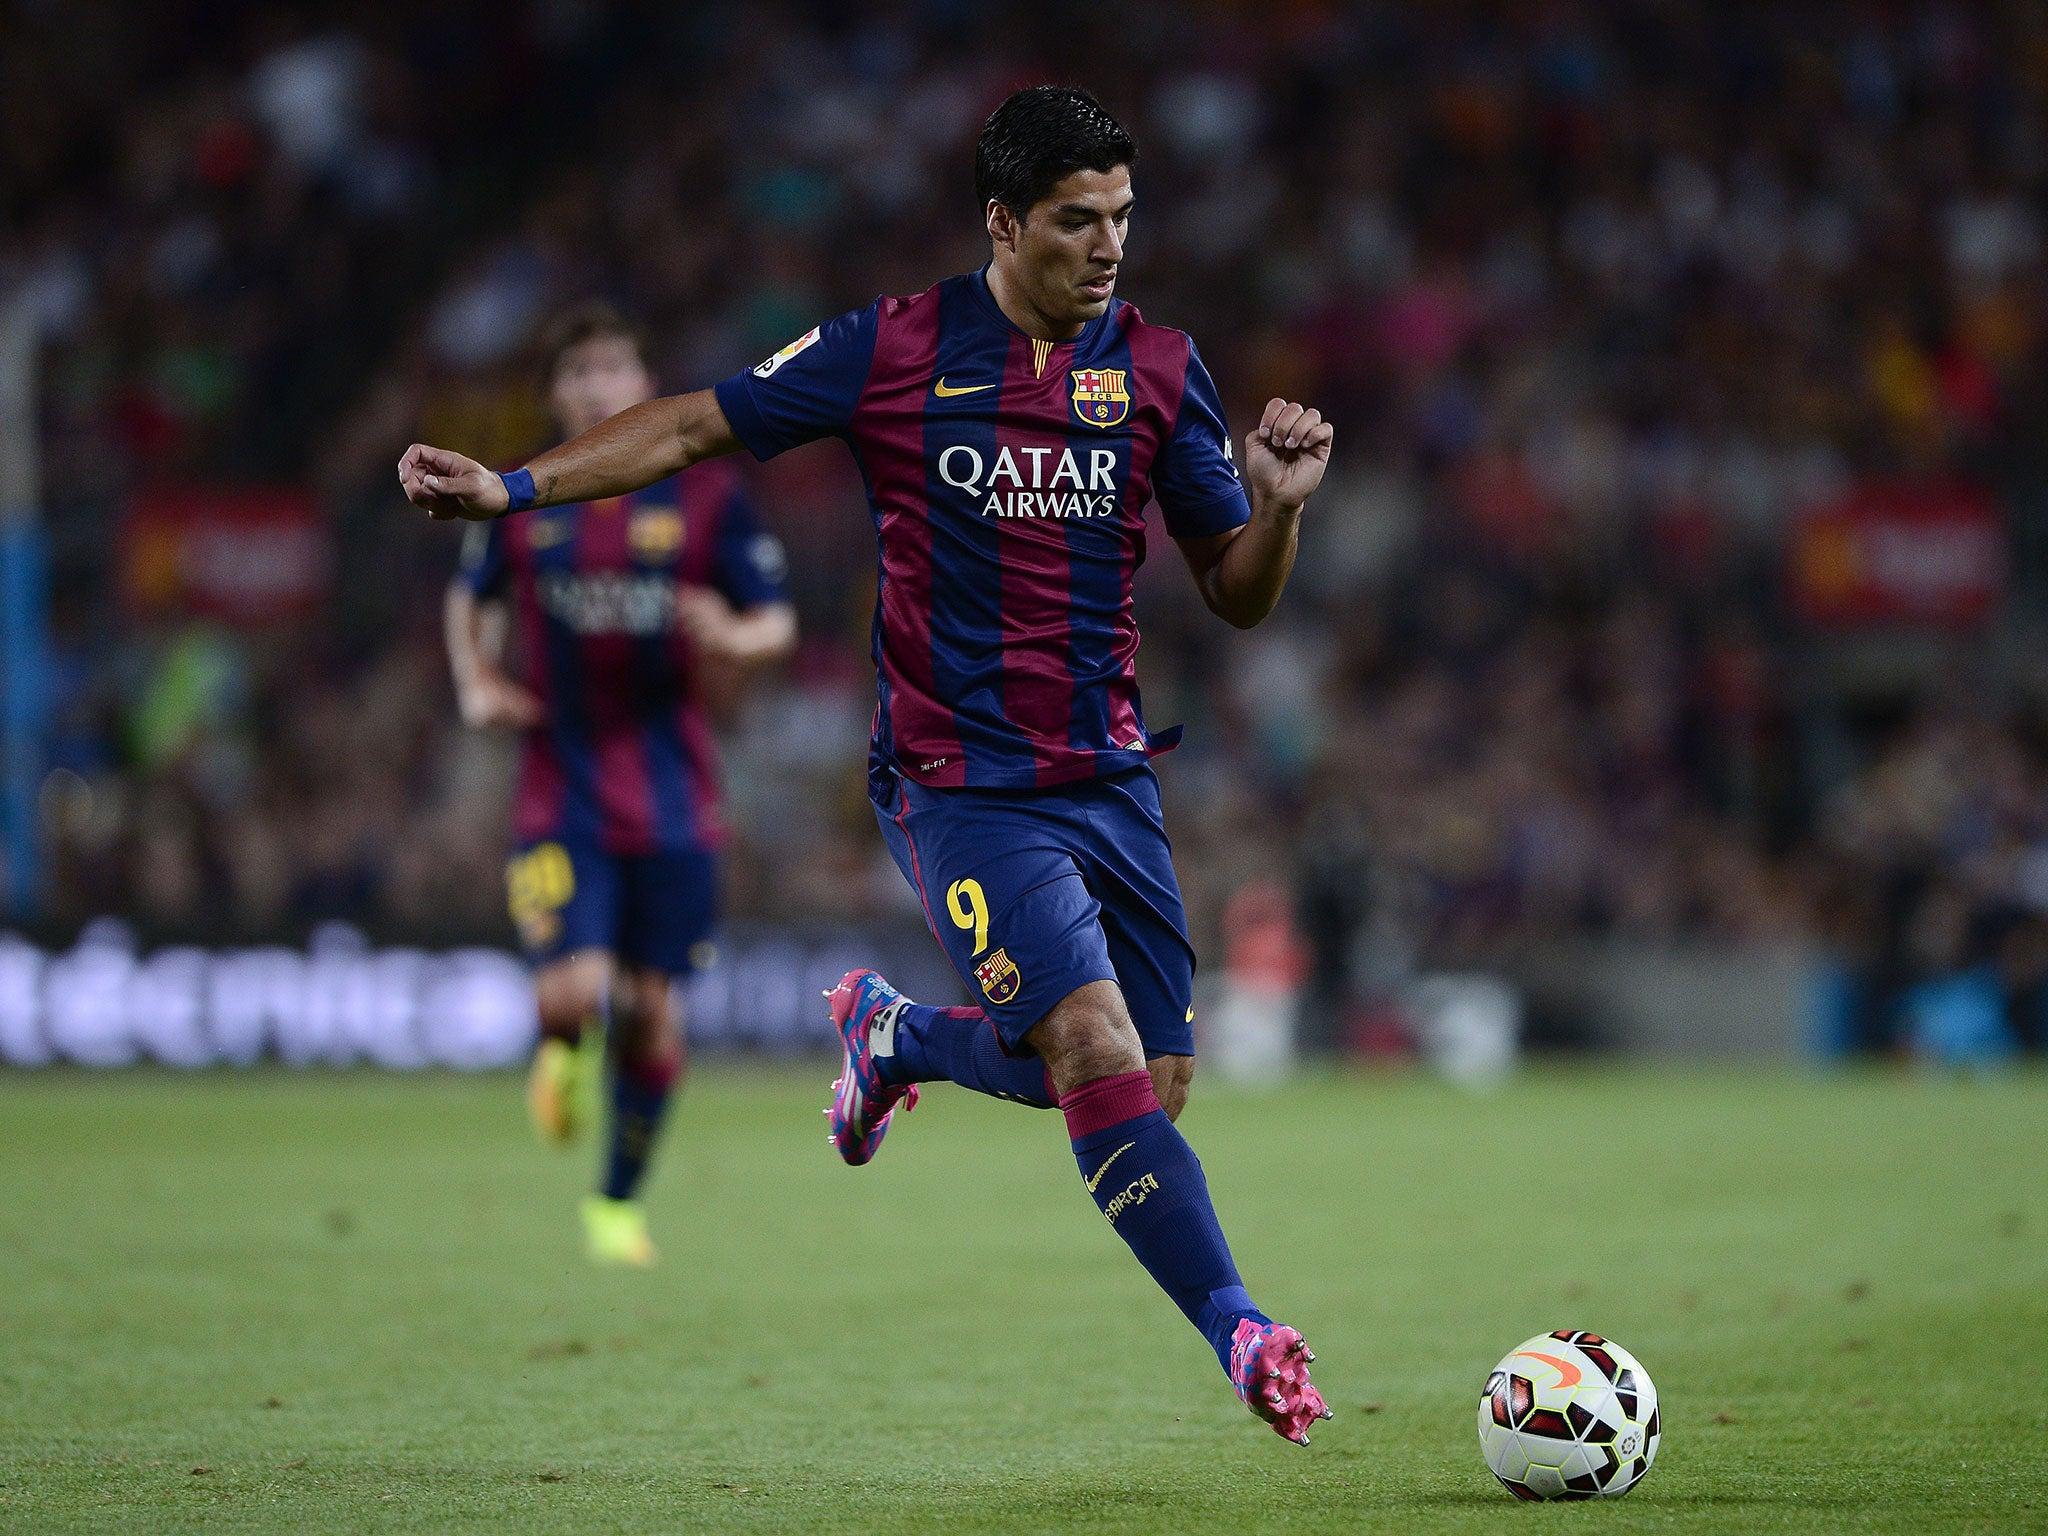 Luis Suarez Simak Statistik Hebat Neymar Suarez Usai Taklukkan Villarreal